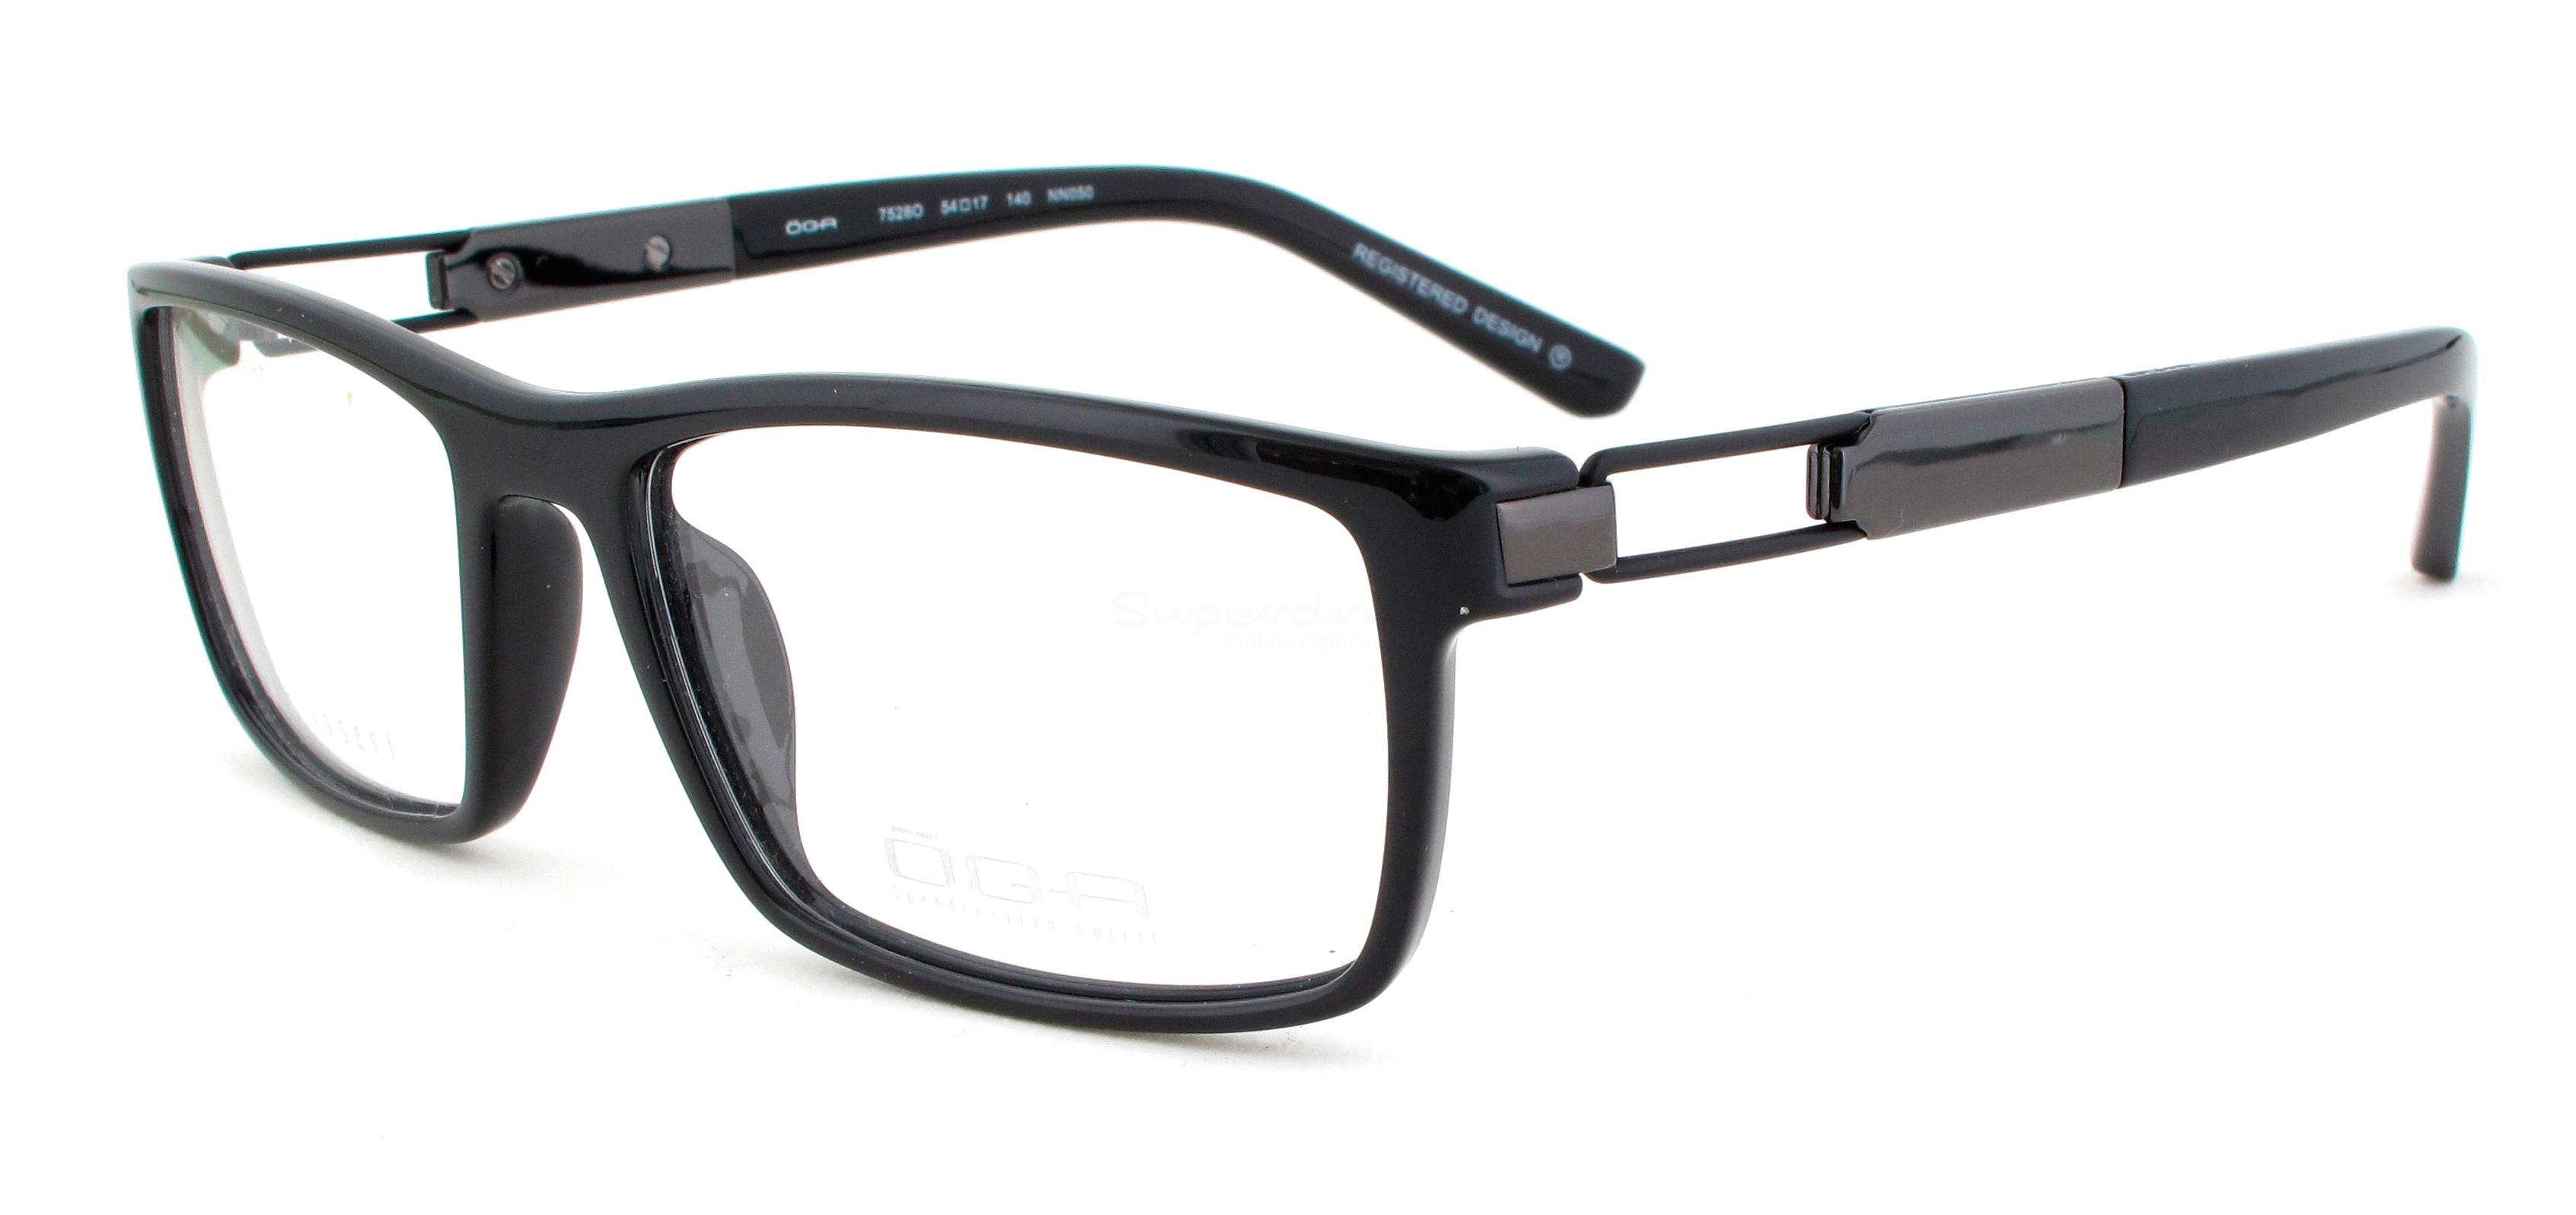 NN050 7528O TRAD 4 Glasses, ÖGA Scandinavian Spirit